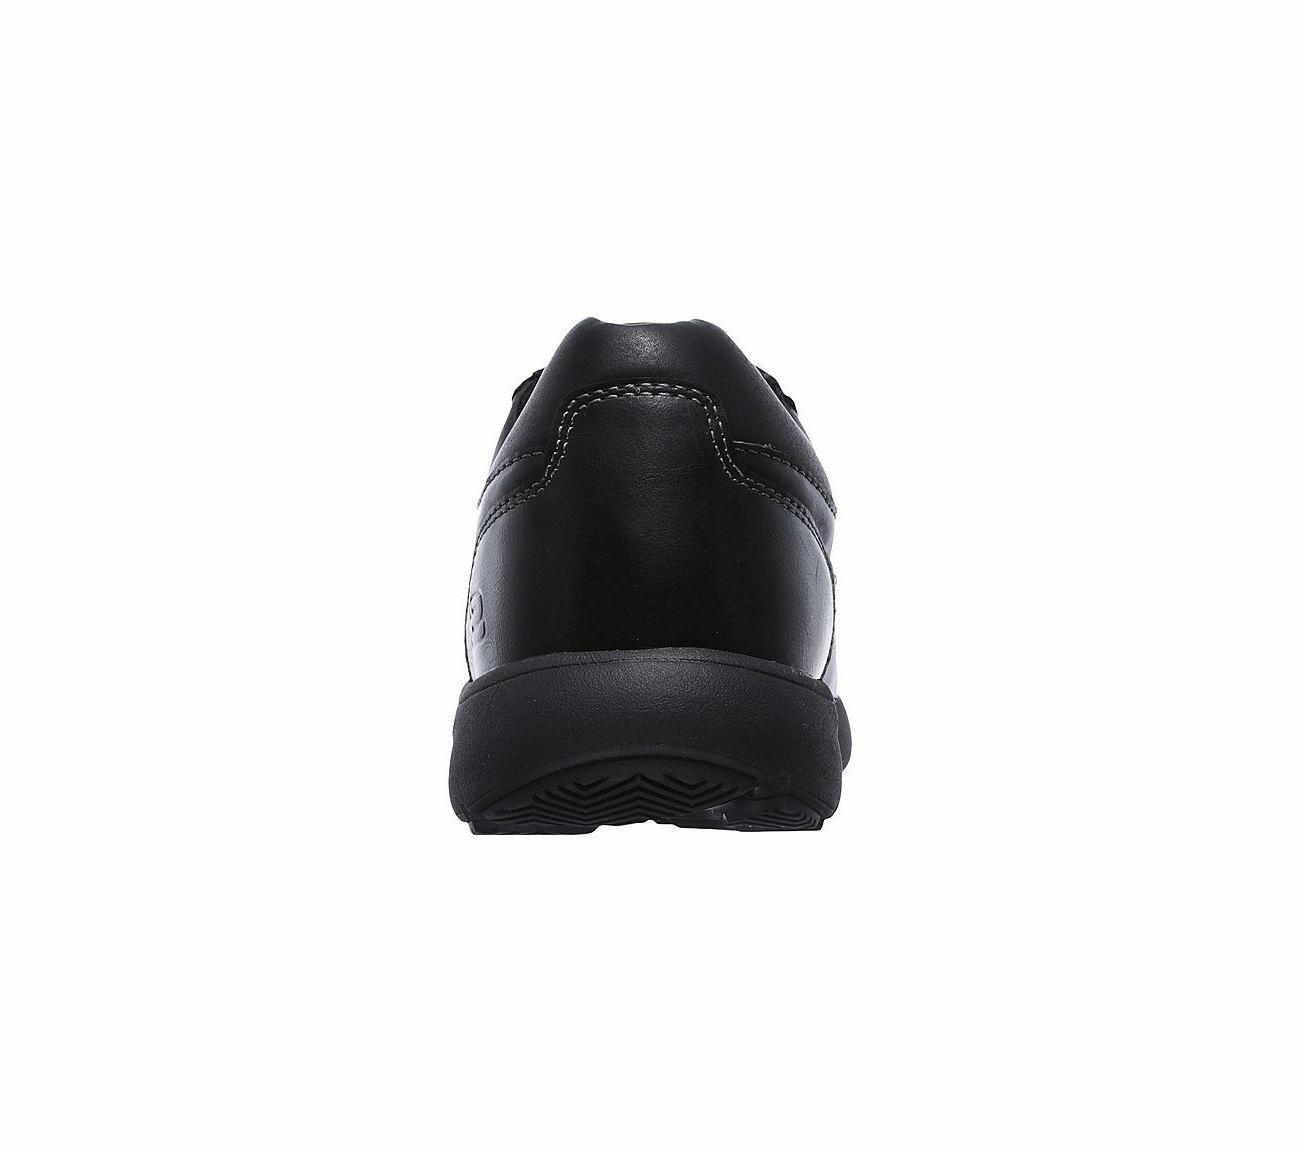 65325 Black Skechers shoes Men Memory Foam Comfort Dress Oxford